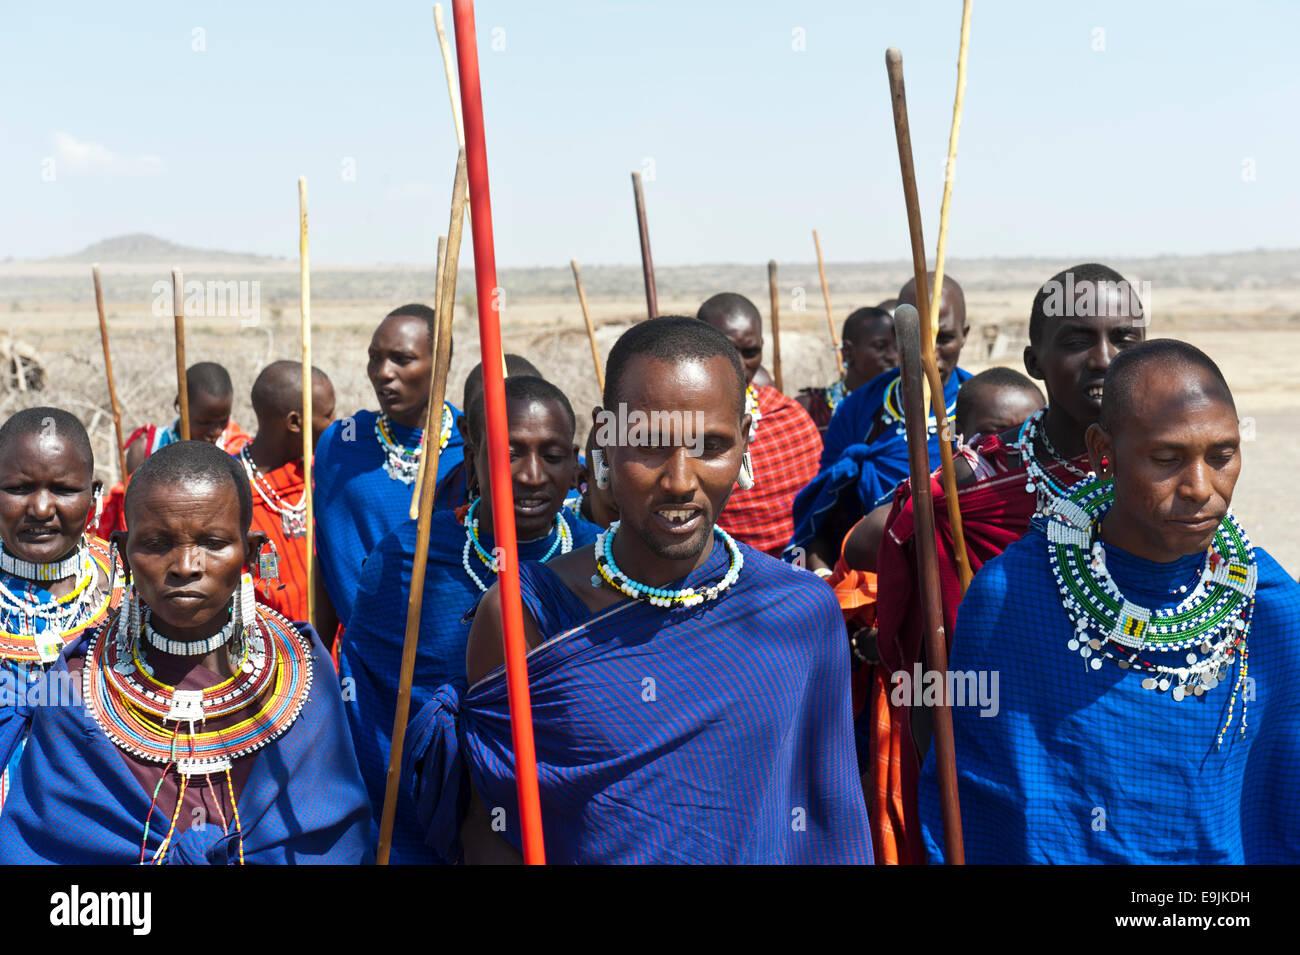 Maasai, group of men and women, Ngorongoro Conservation Area, Kiloki, Tanzania - Stock Image